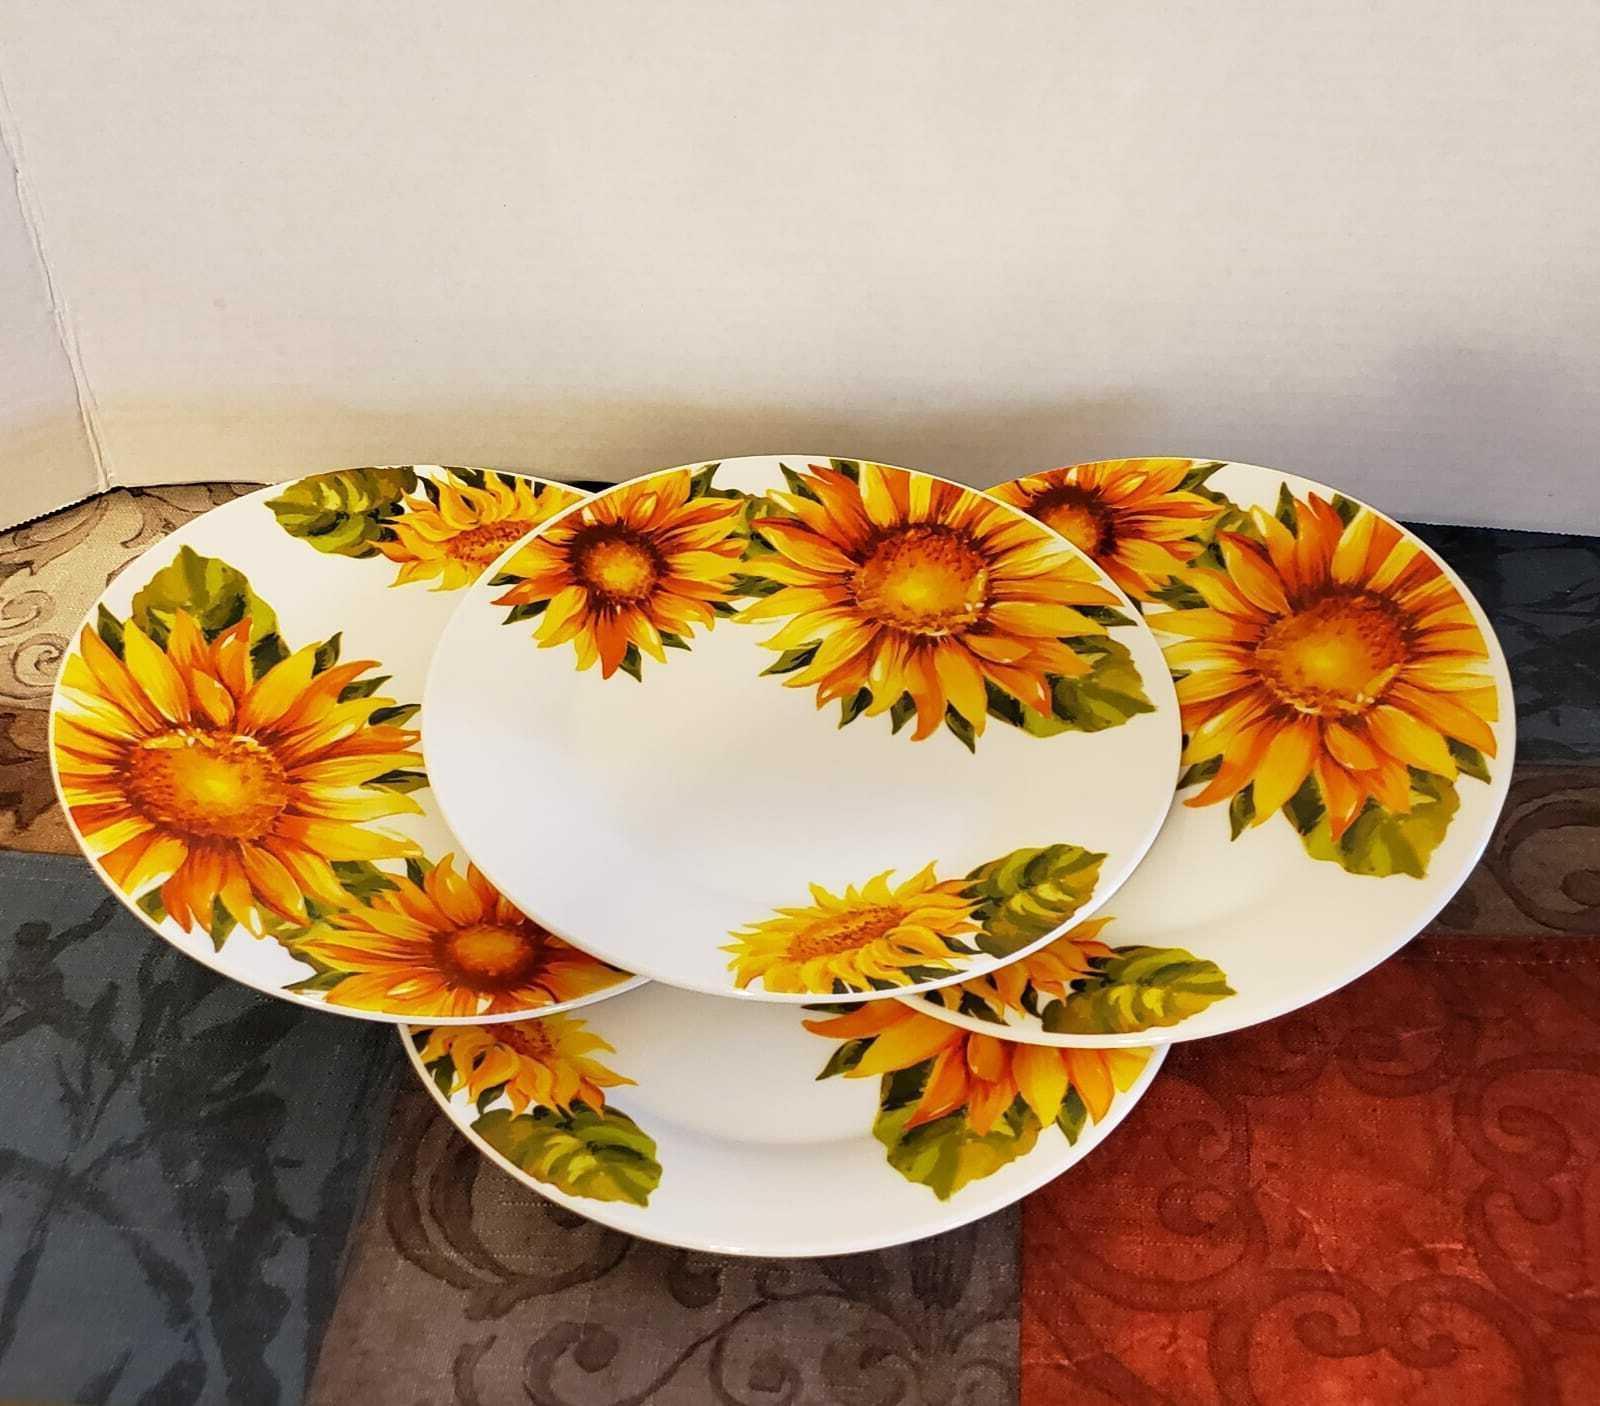 Sunflower Royal Norfolk Home Set 16- Piece